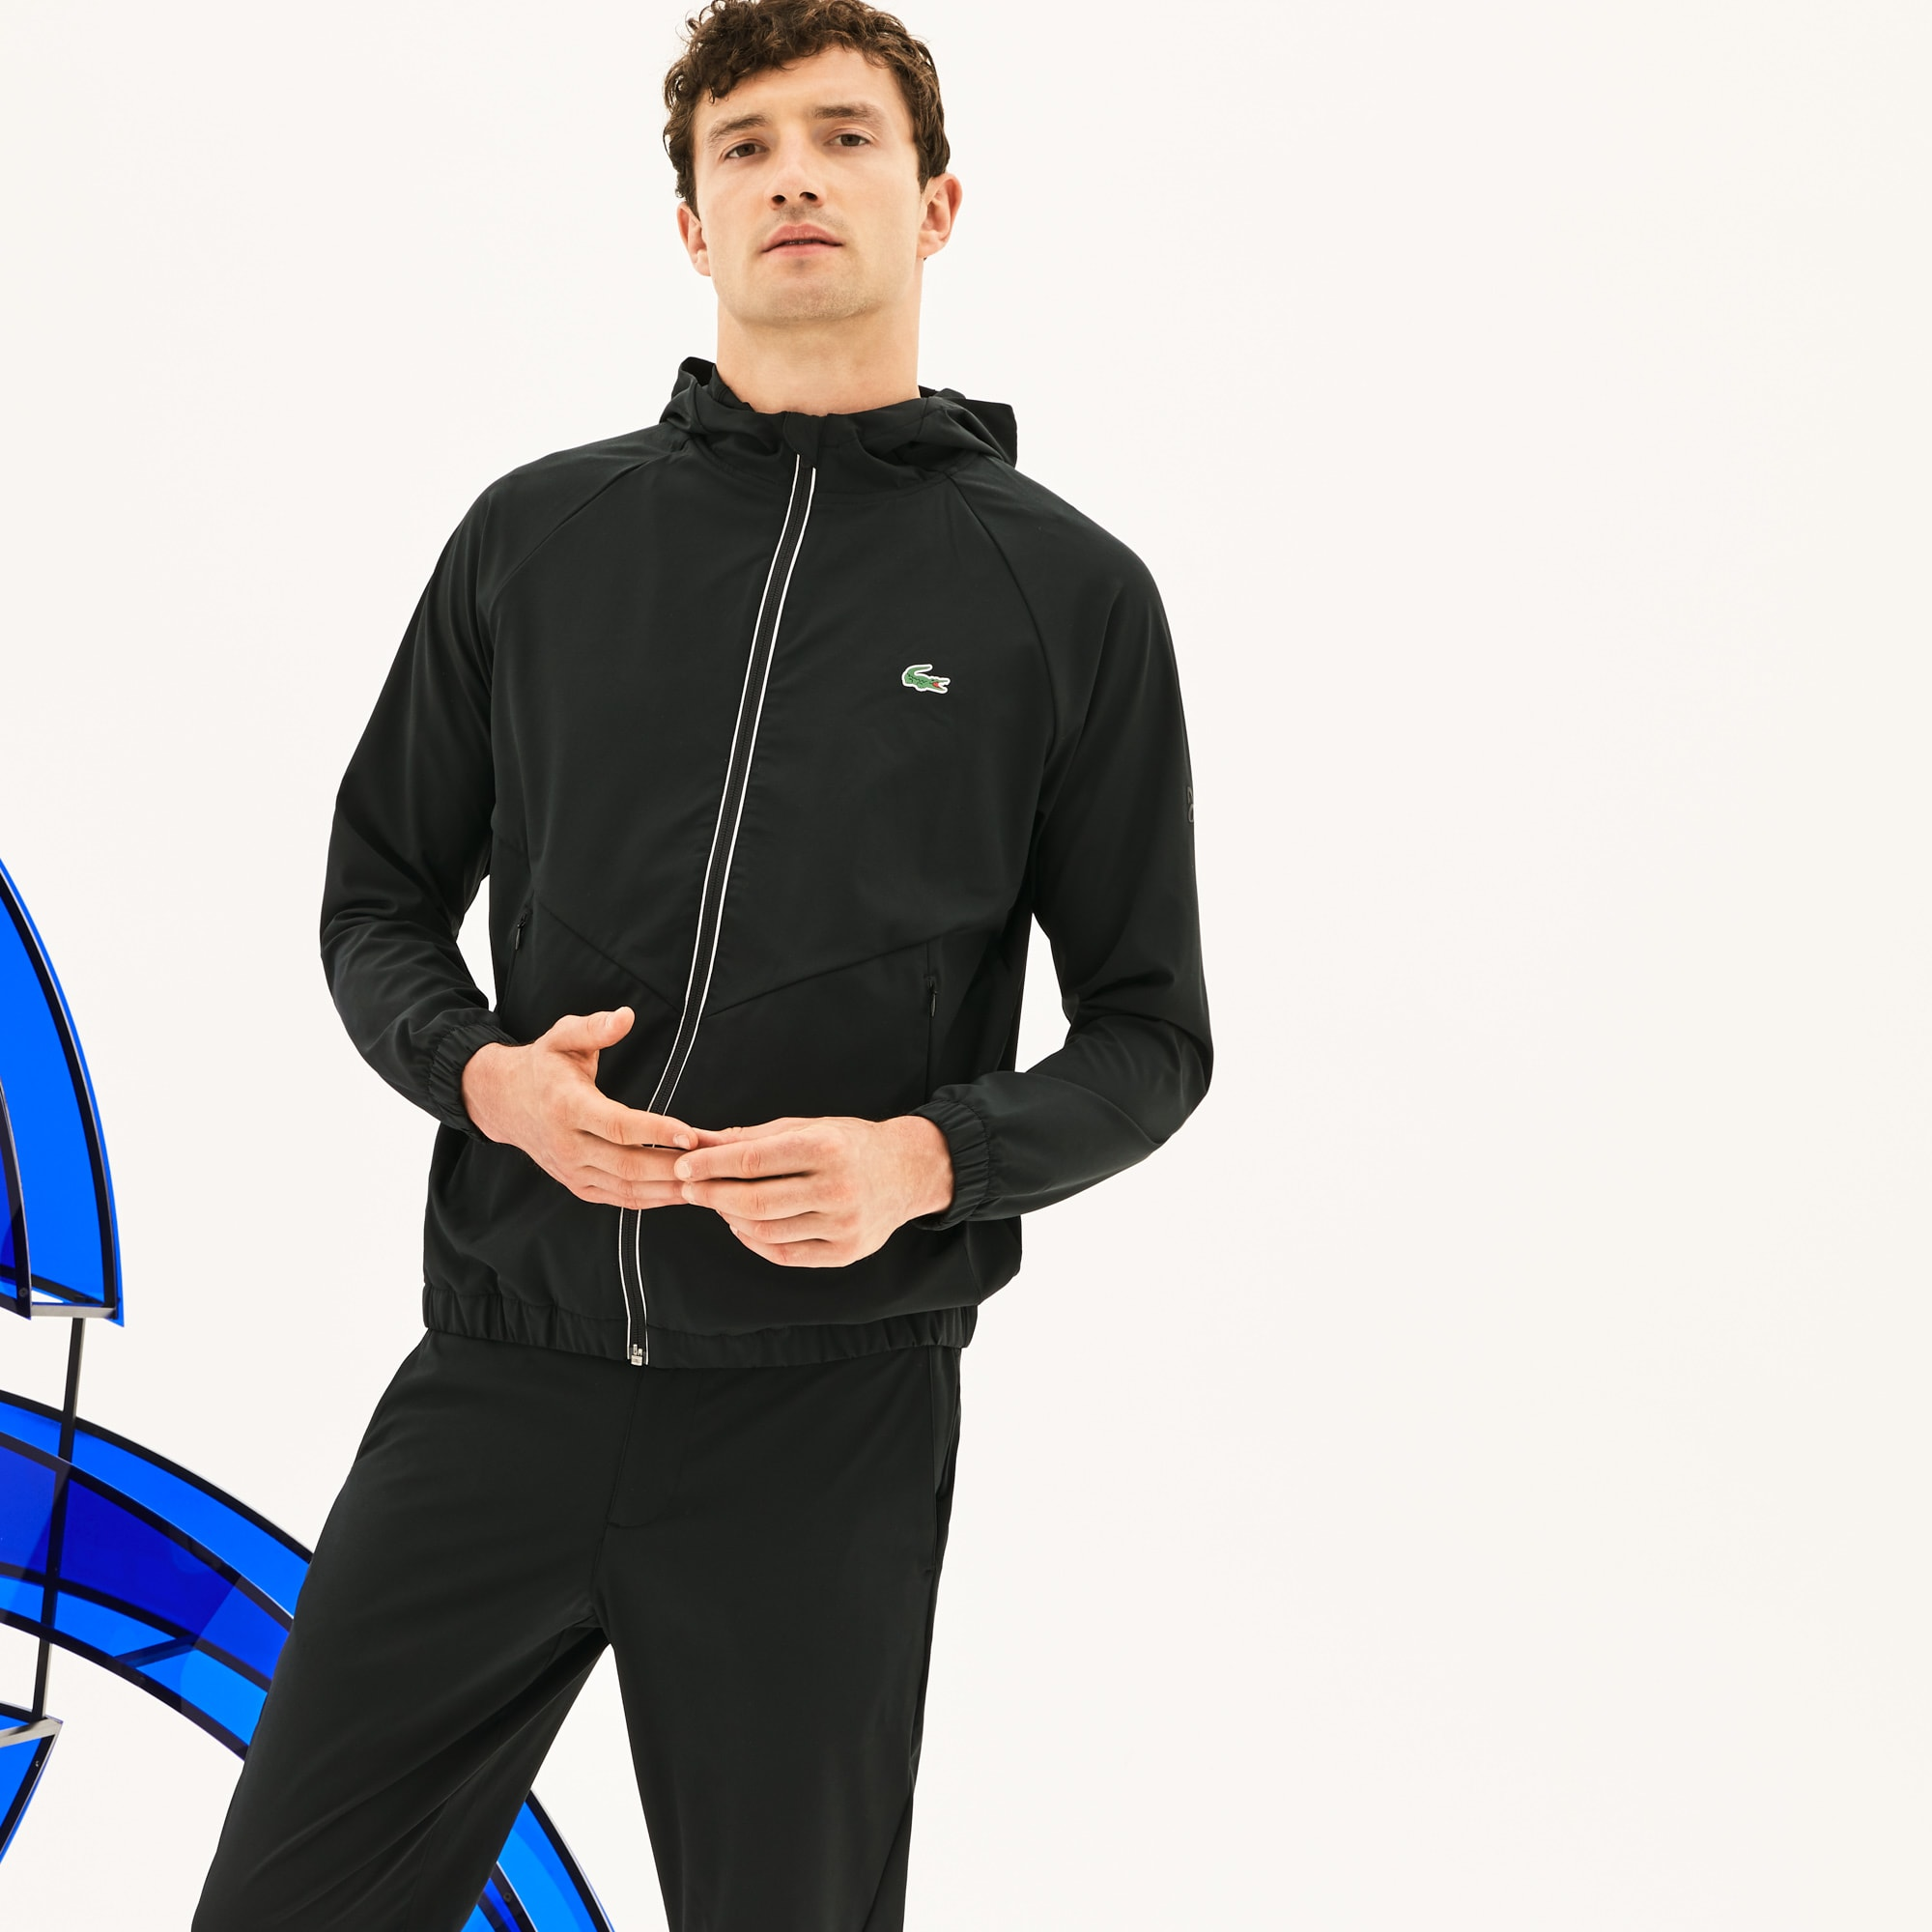 Men's Lacoste SPORT NOVAK DJOKOVIC-OFF COURT PREMIUM COLLECTION Hooded Stretch Technical Midlayer Jacket